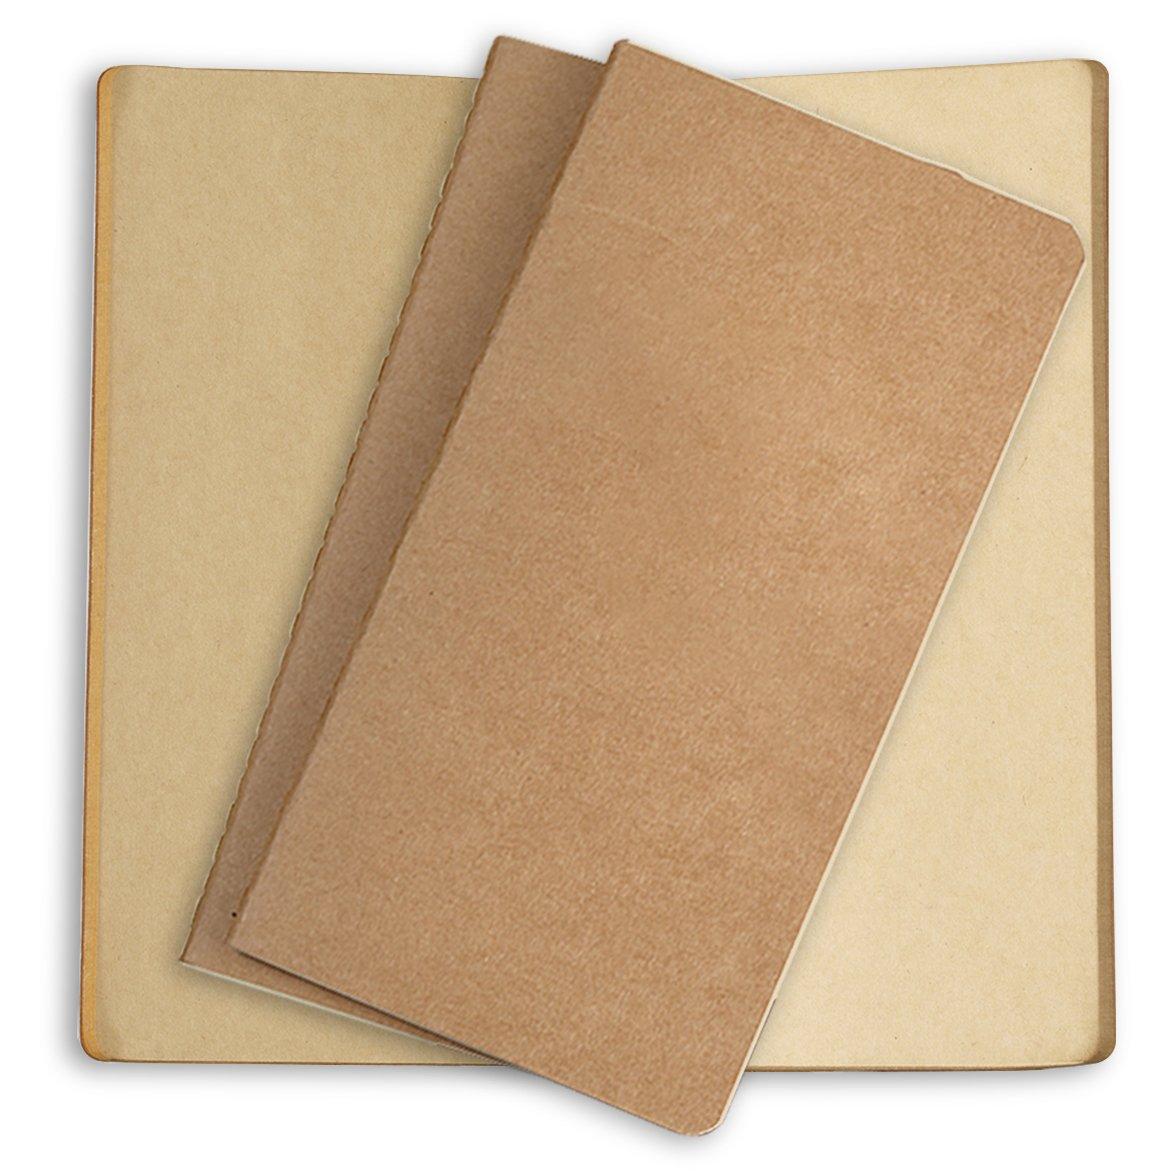 Sovereign-Gear - Set di 3 quaderni di ricambio per diario in pelle 3 Cream - Squares SG-PRPP-3